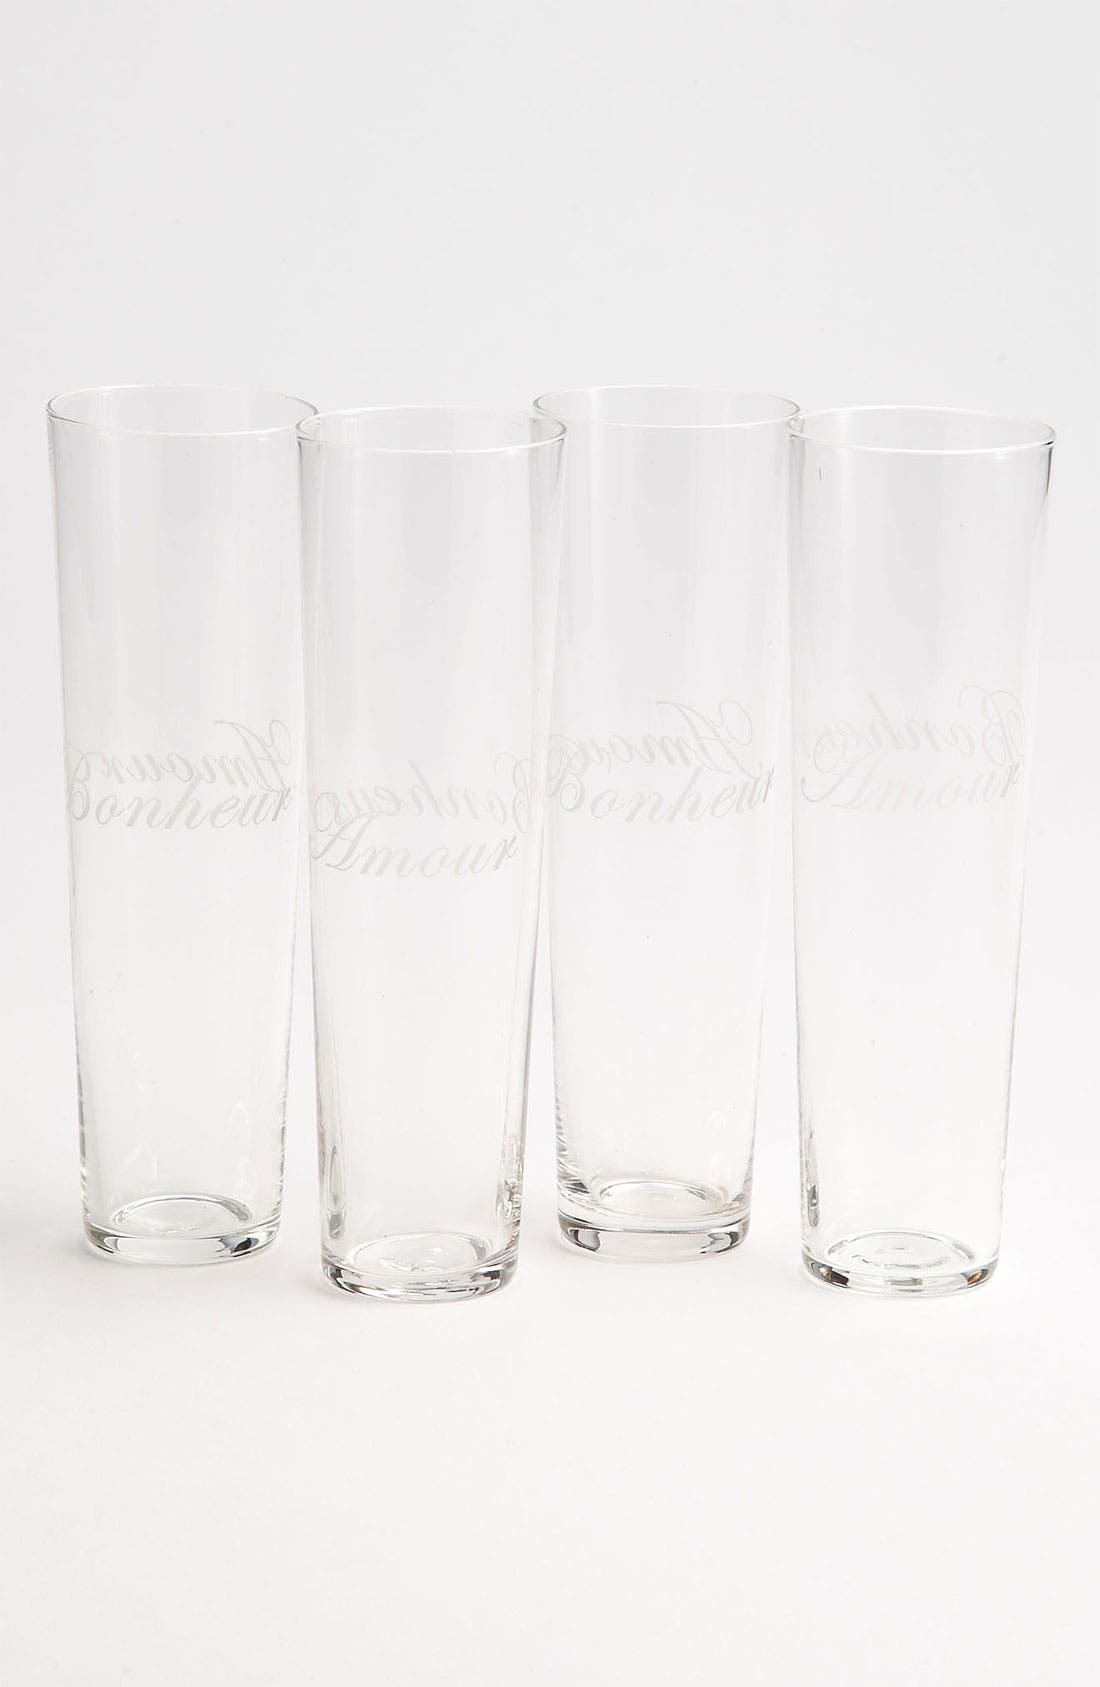 Main Image - 'Amour Bonheur' Etched Champagne Flutes (Set of 4)